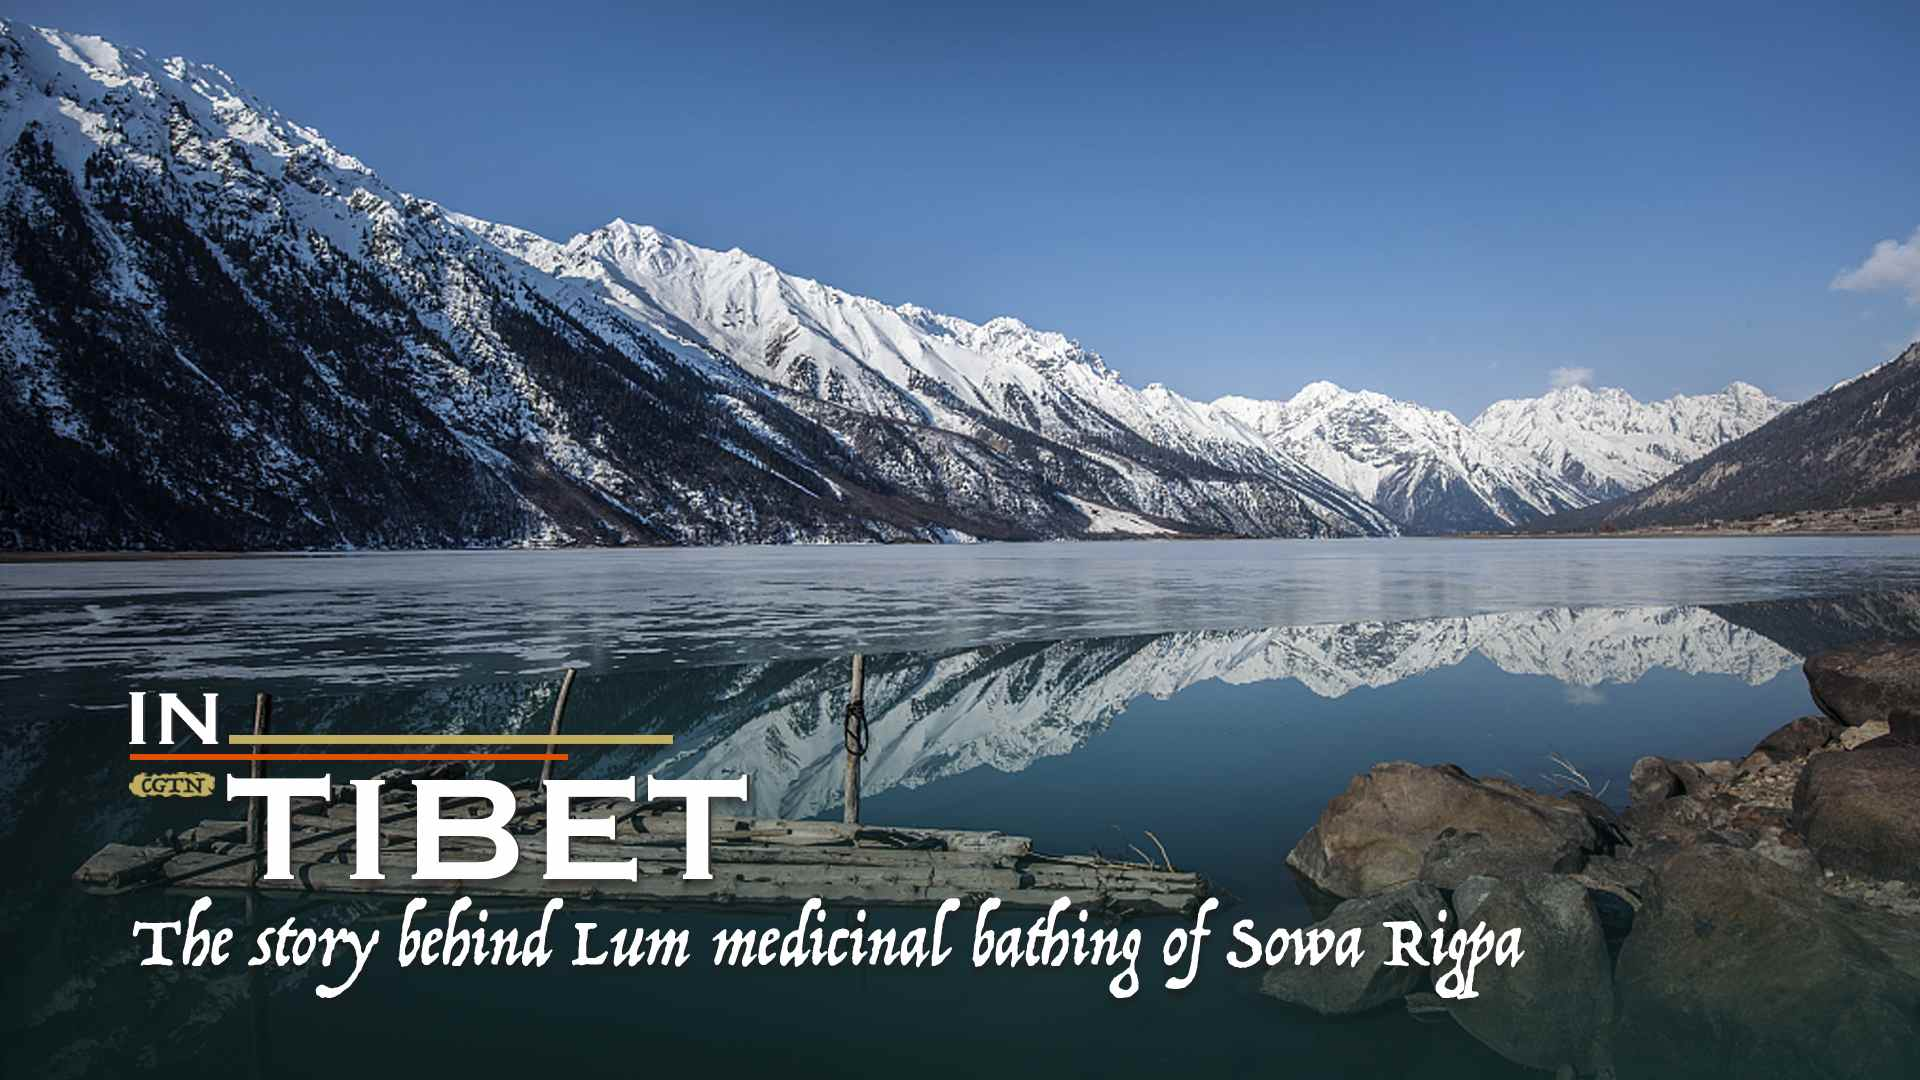 In Tibet: The story behind Lum medicinal bathing of Sowa Rigpa